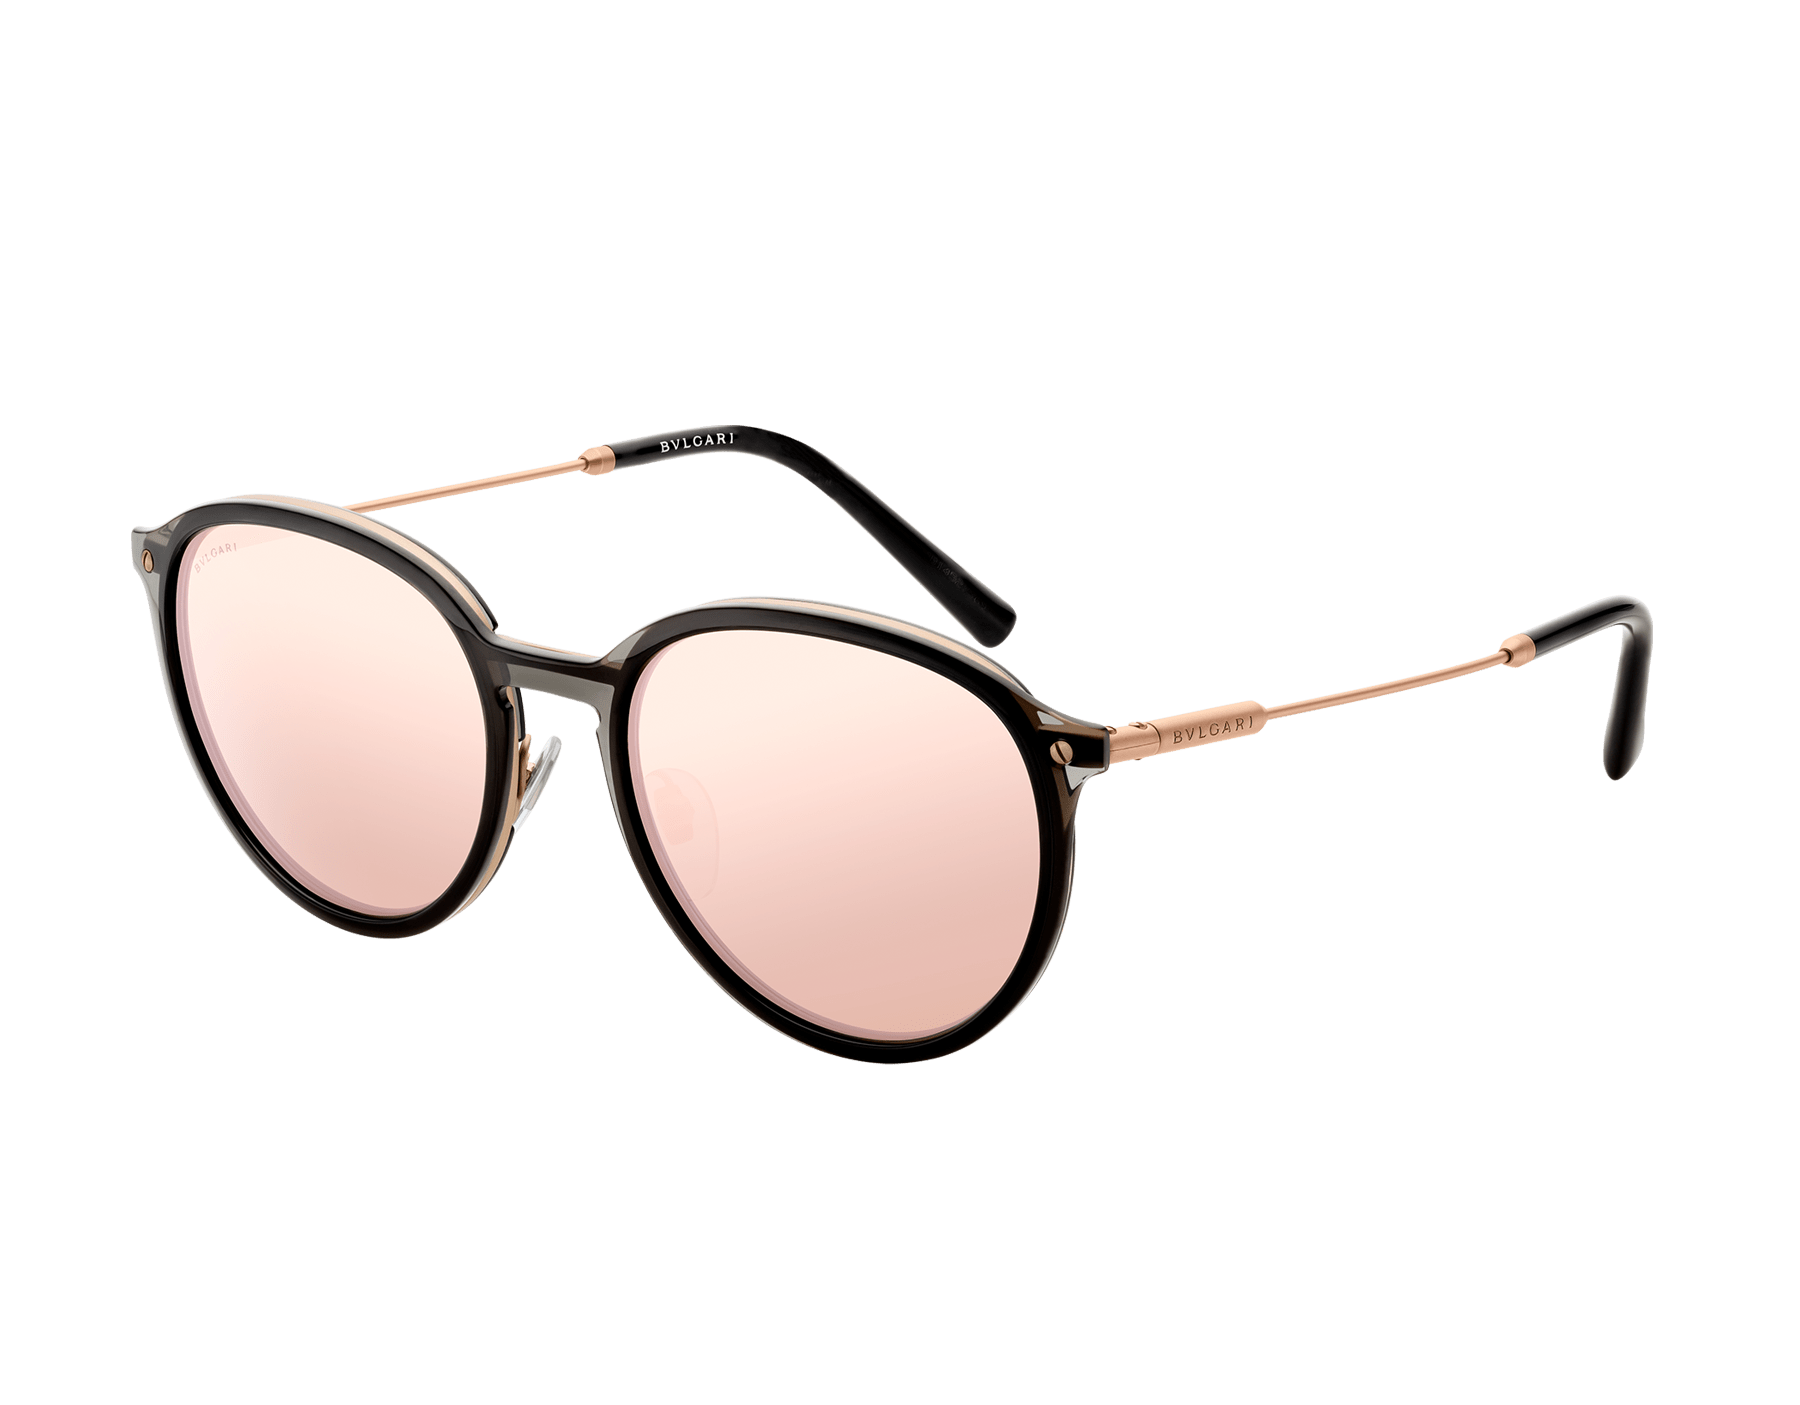 Óculos de sol Diagono com formato redondo em metal. 903556 image 1